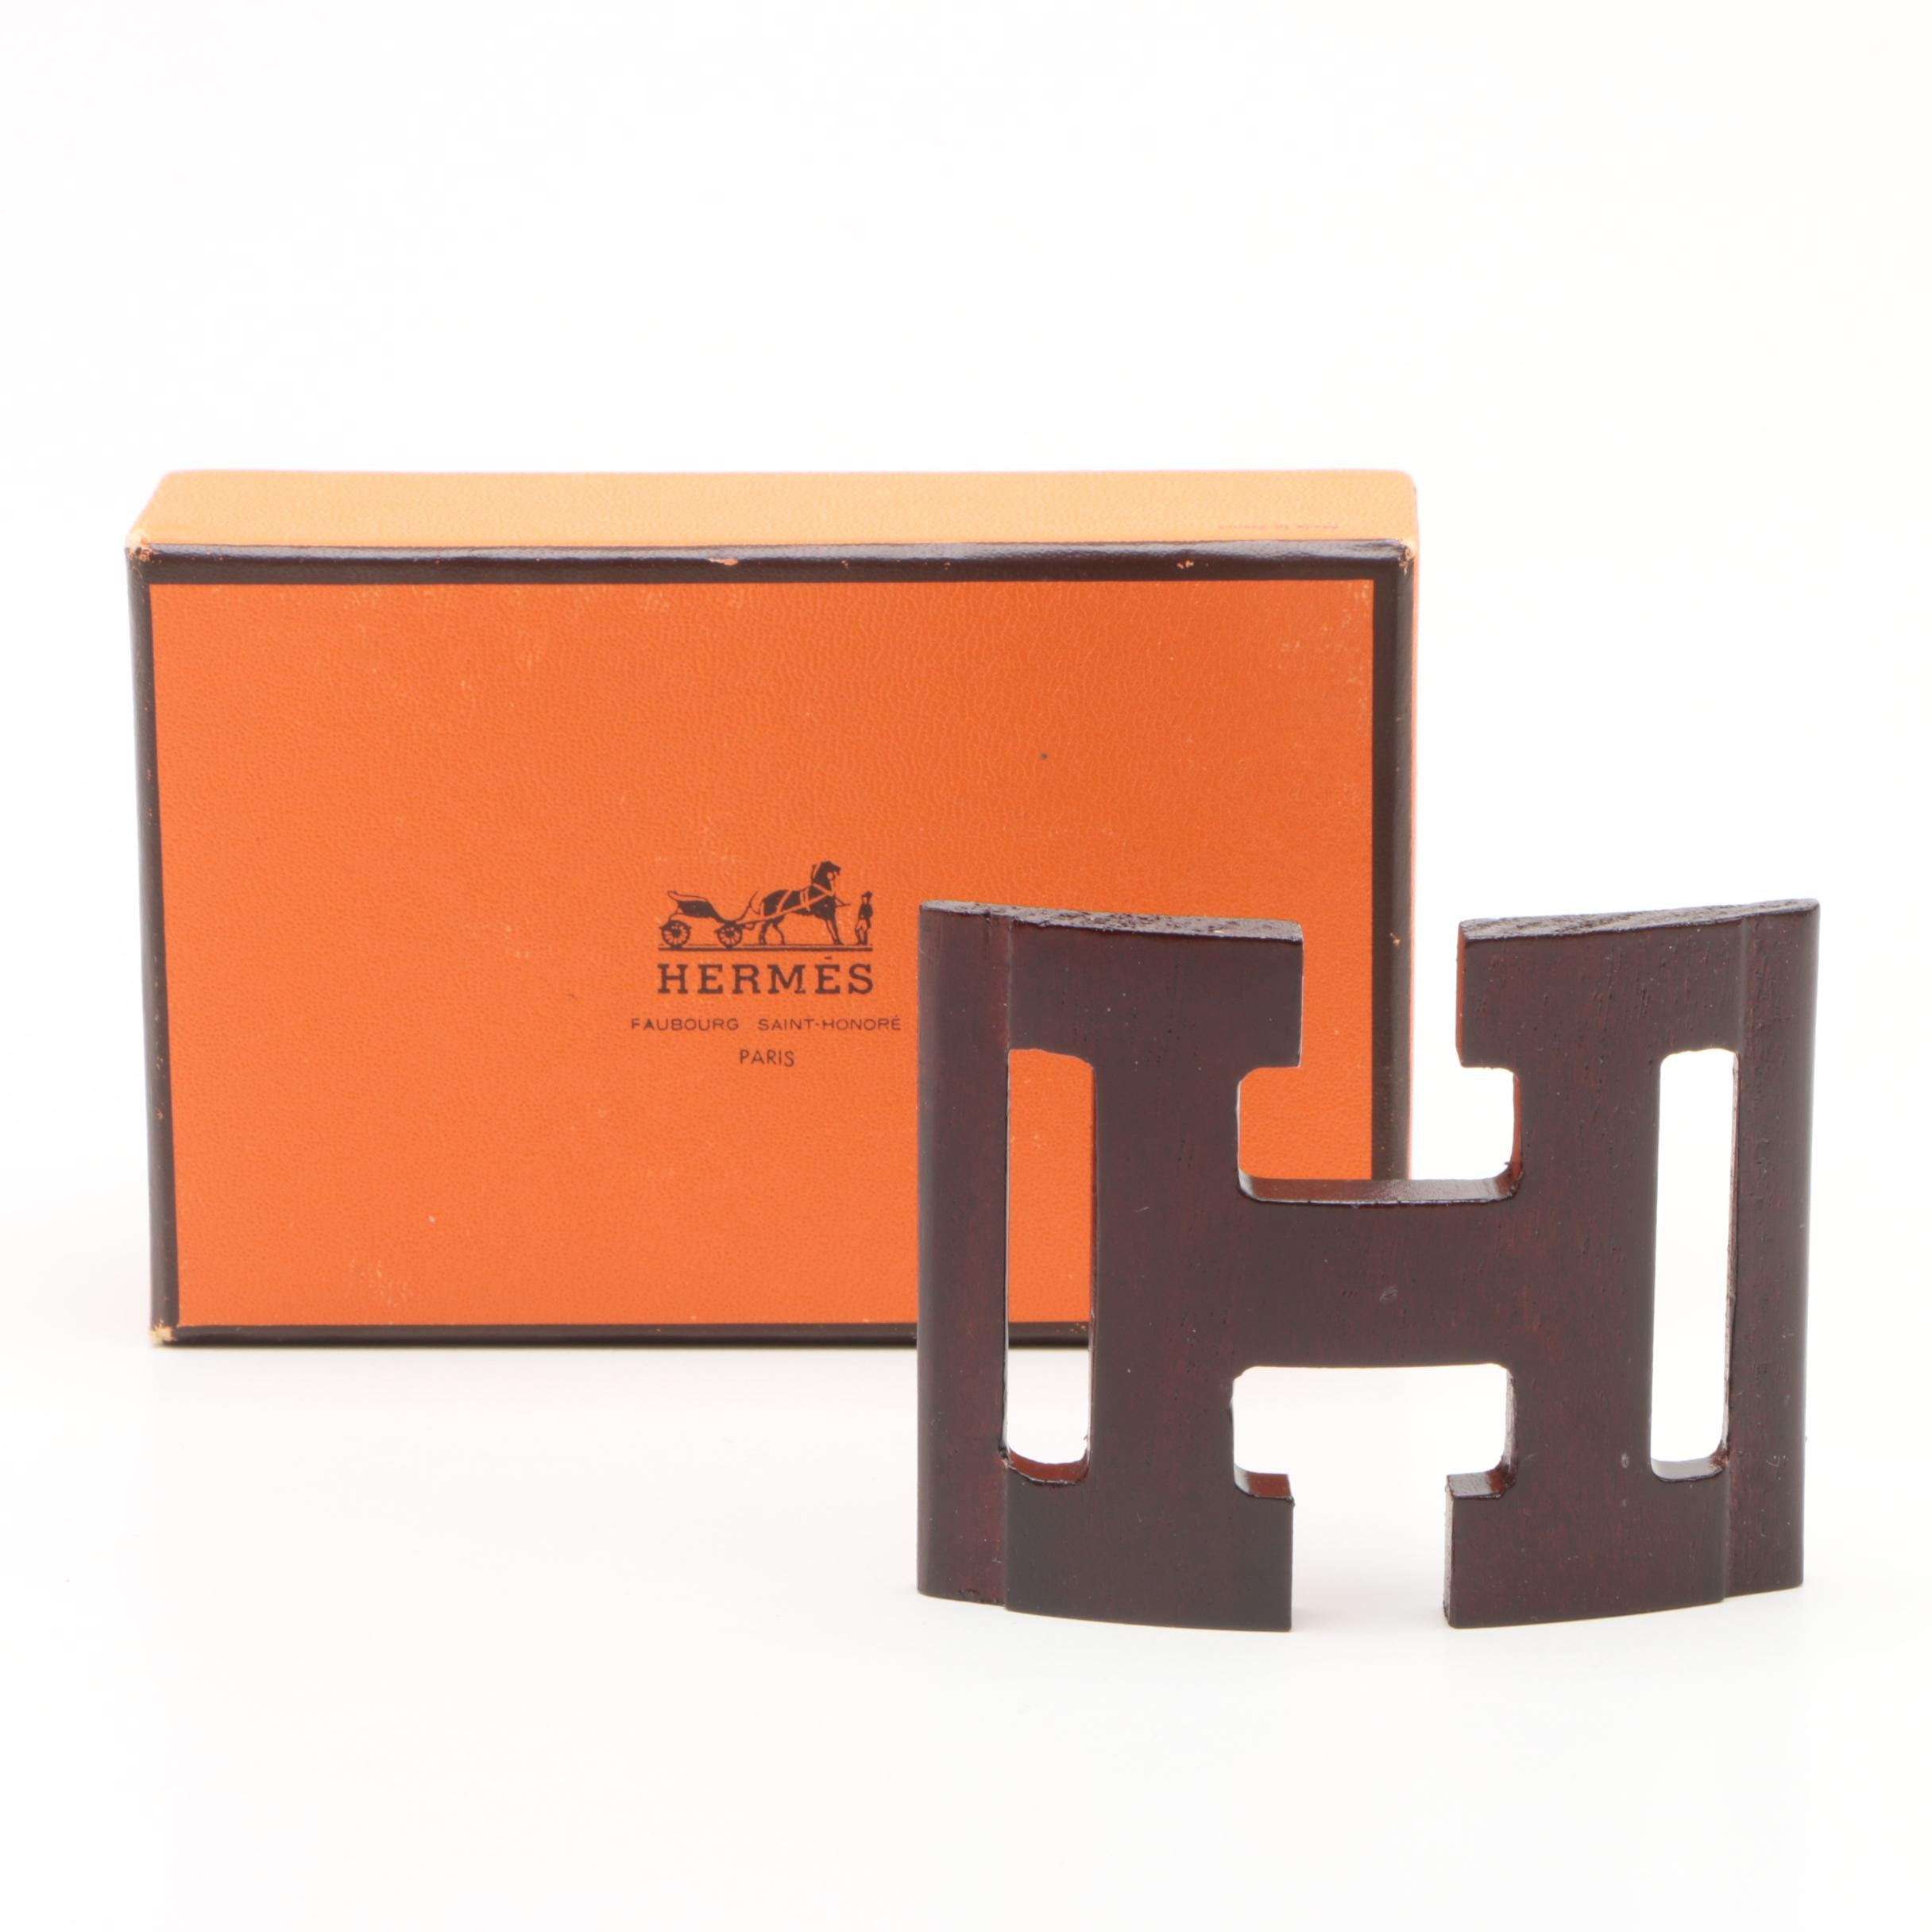 Vintage Hermès of Paris Wooden Scarf/Belt Buckle